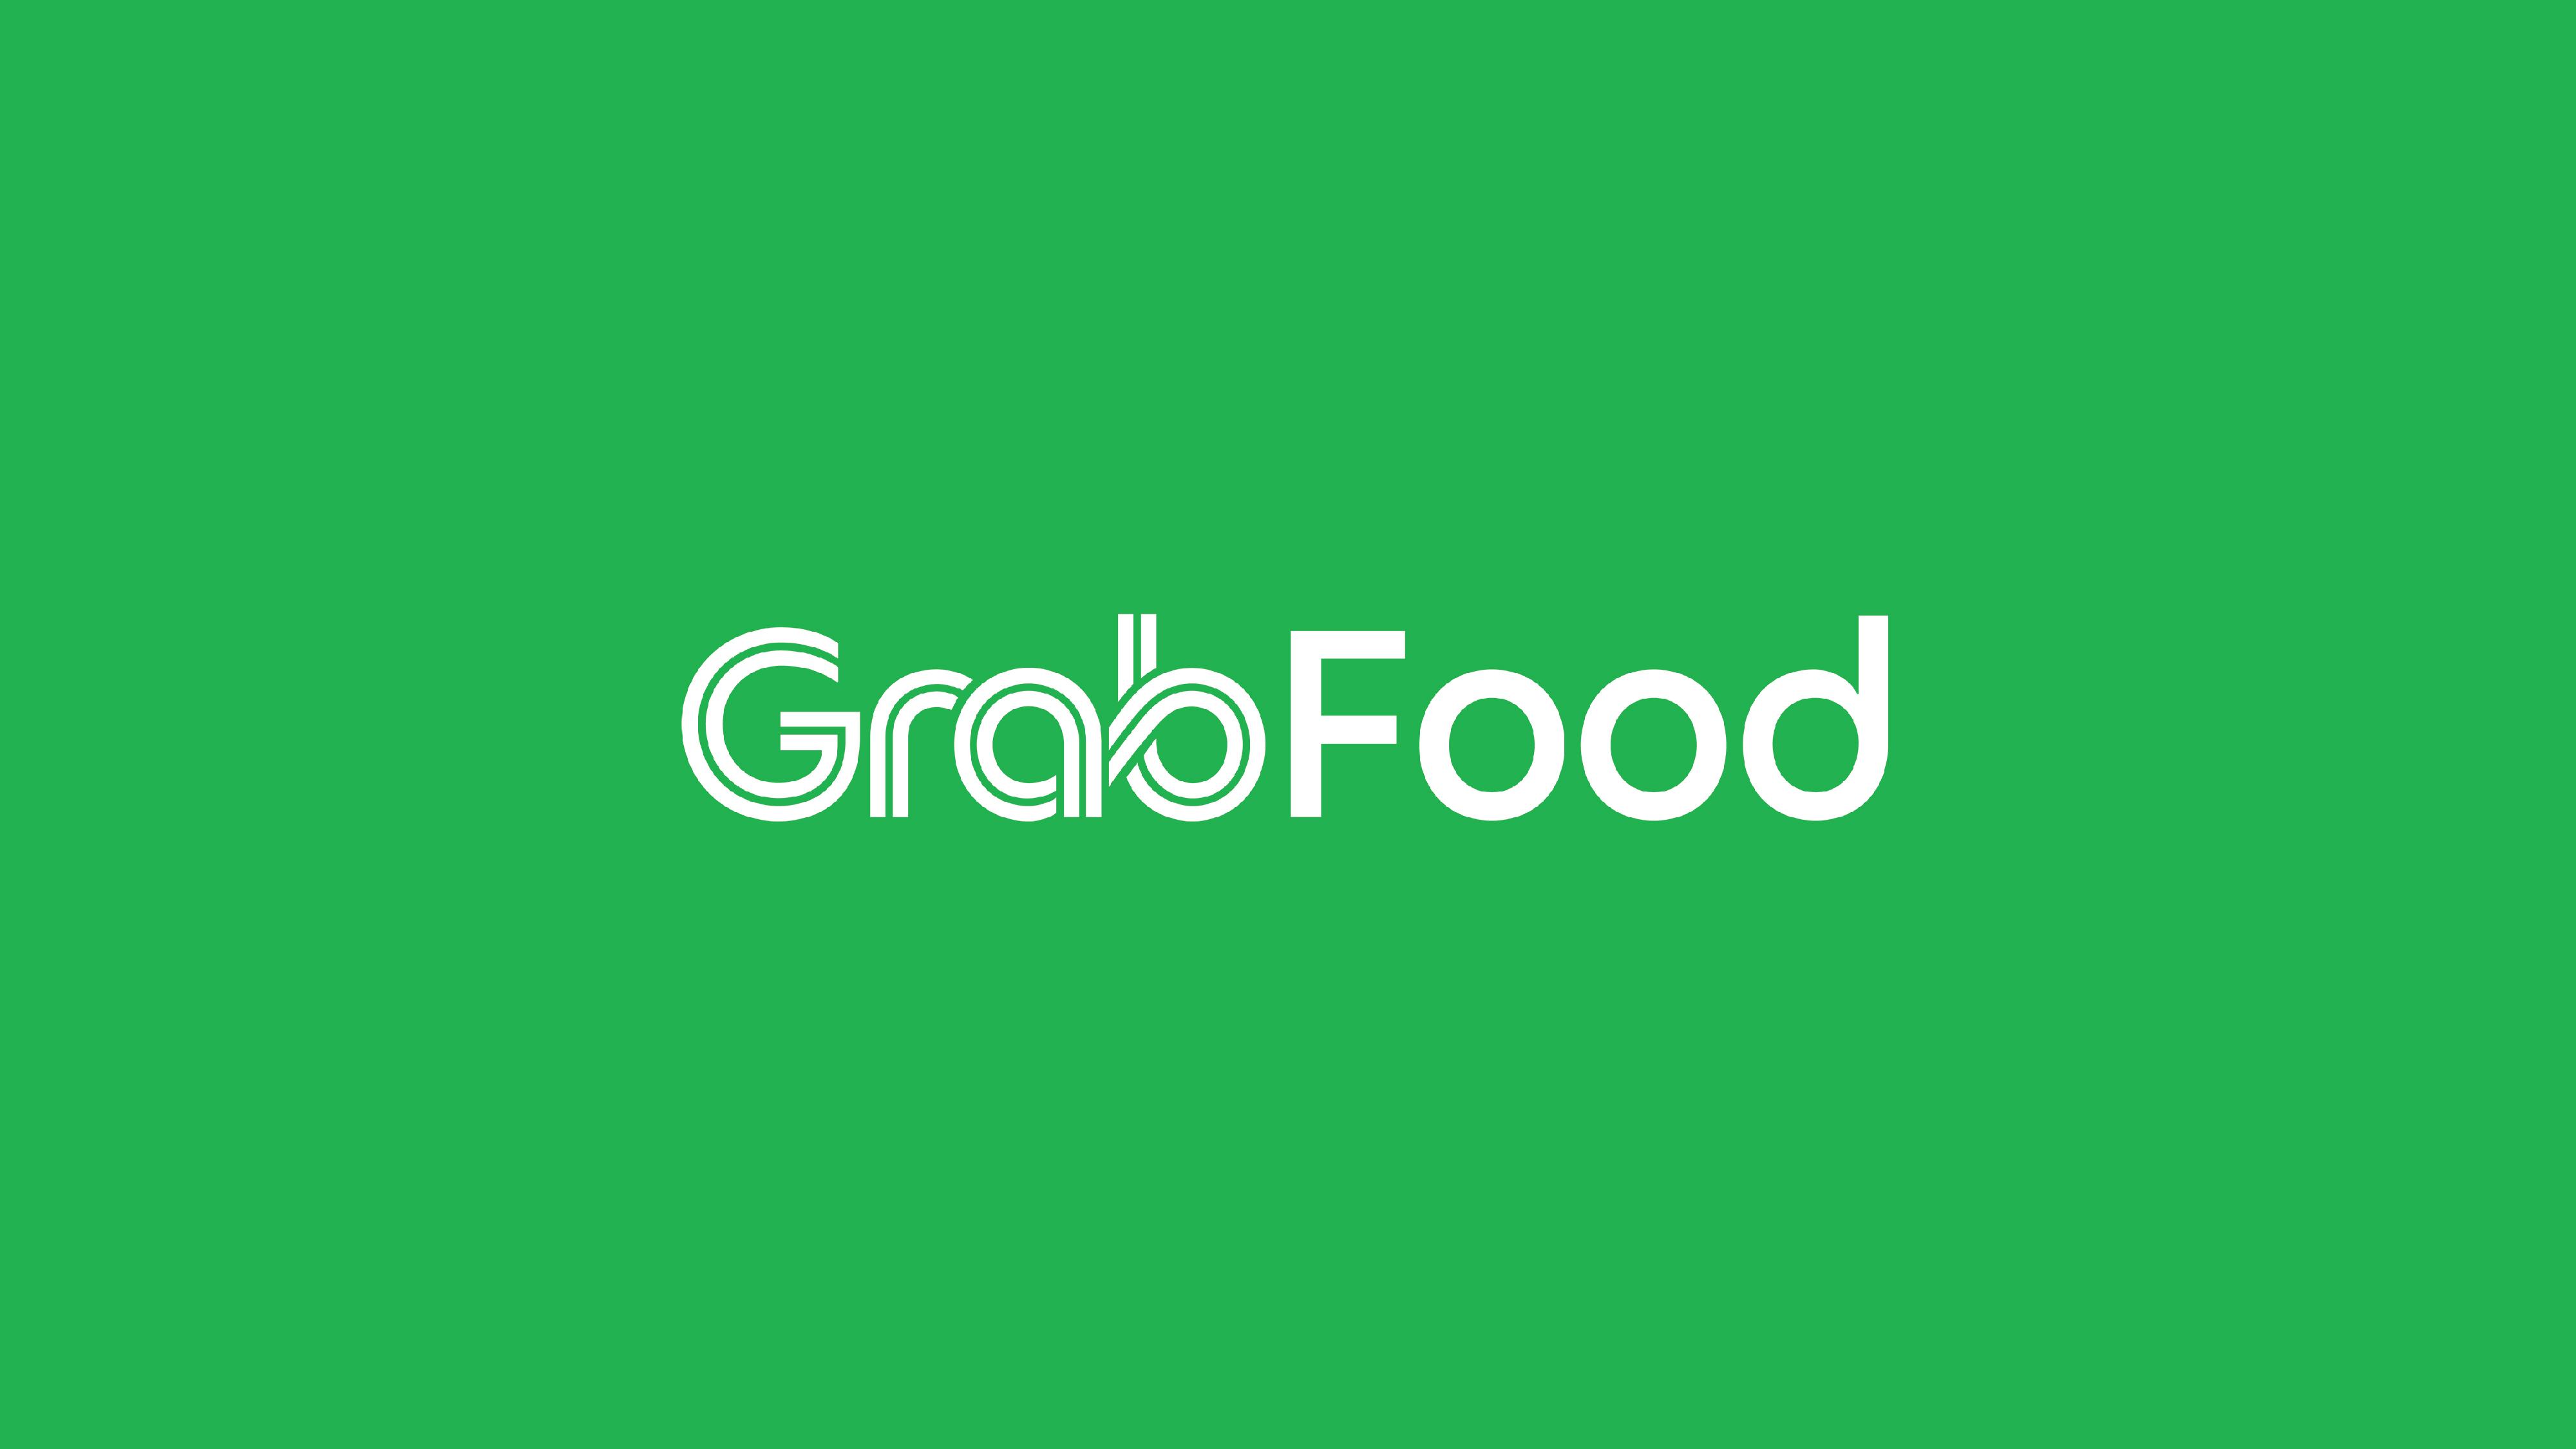 Grabfood_logo_1920x1080px